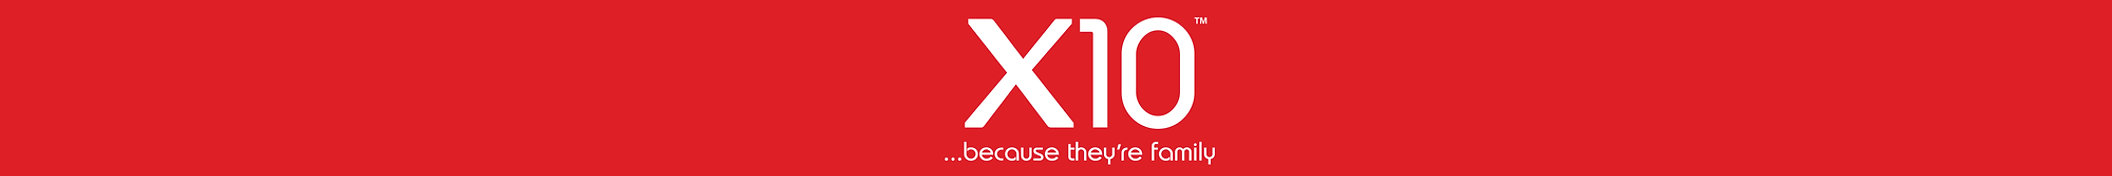 X10 Website Banner.jpg